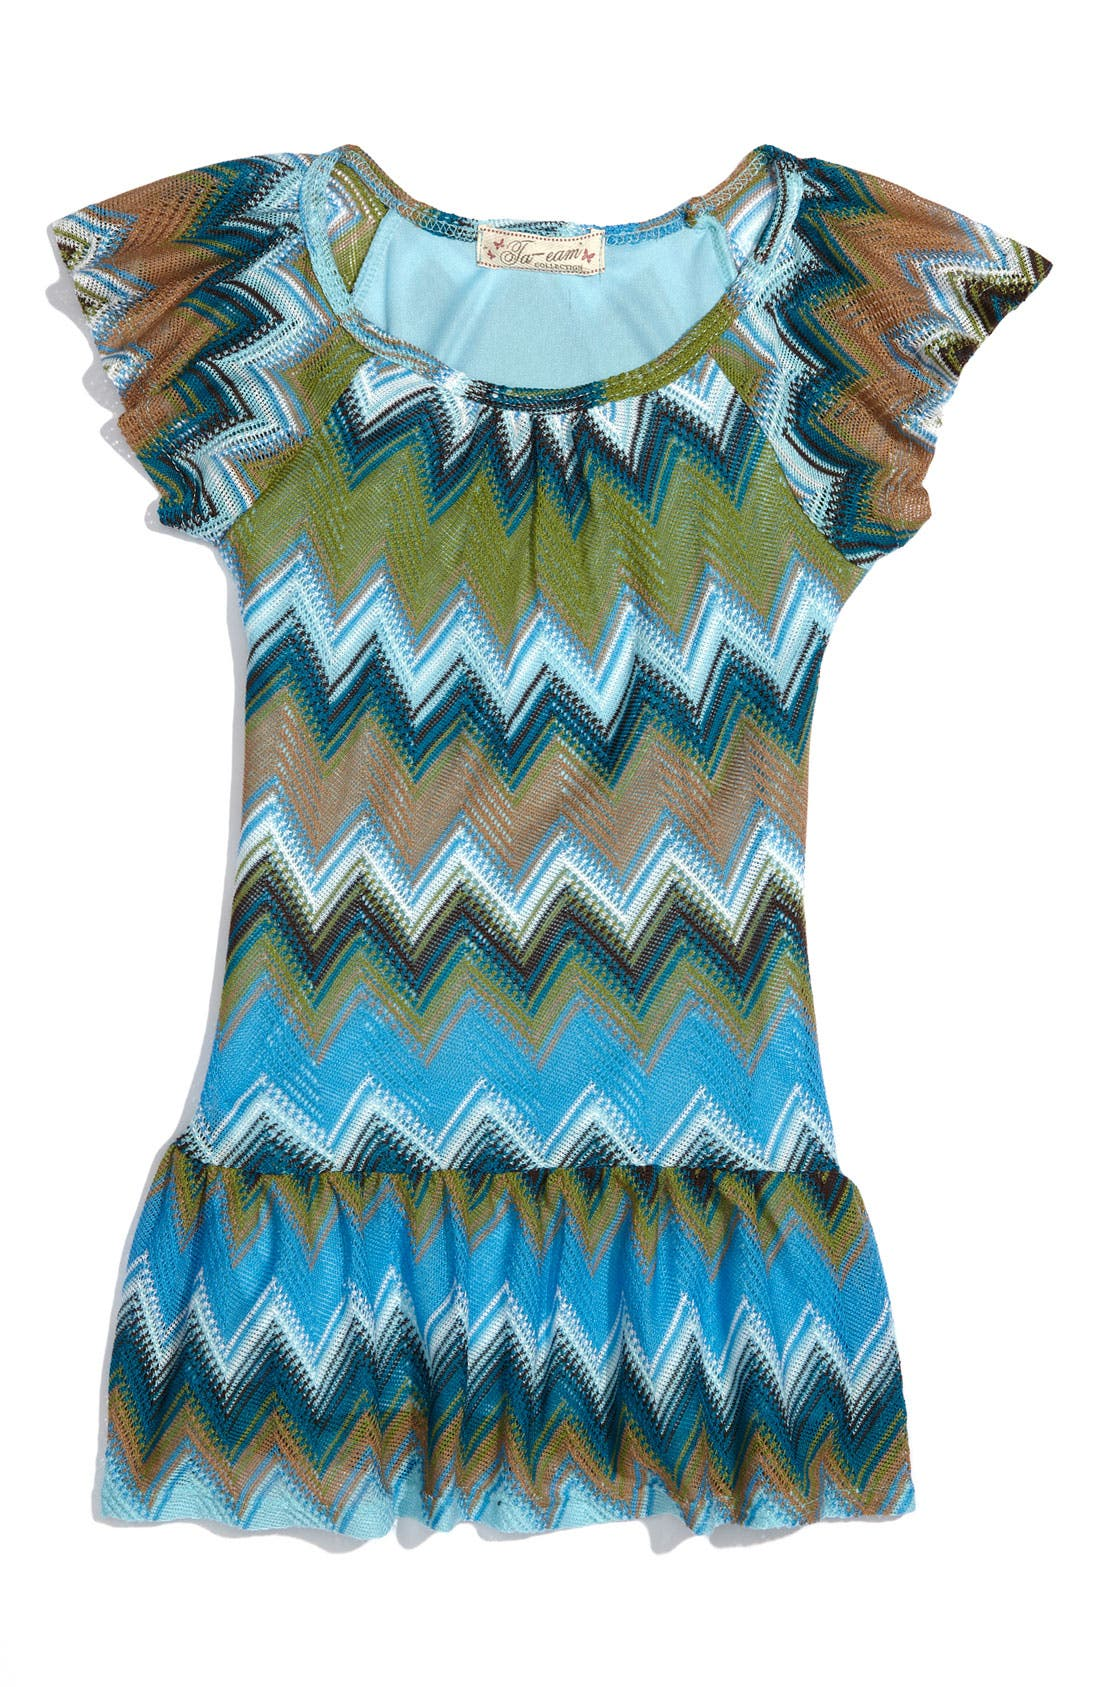 Alternate Image 1 Selected - TA-EAM Knit Tunic (Toddler)